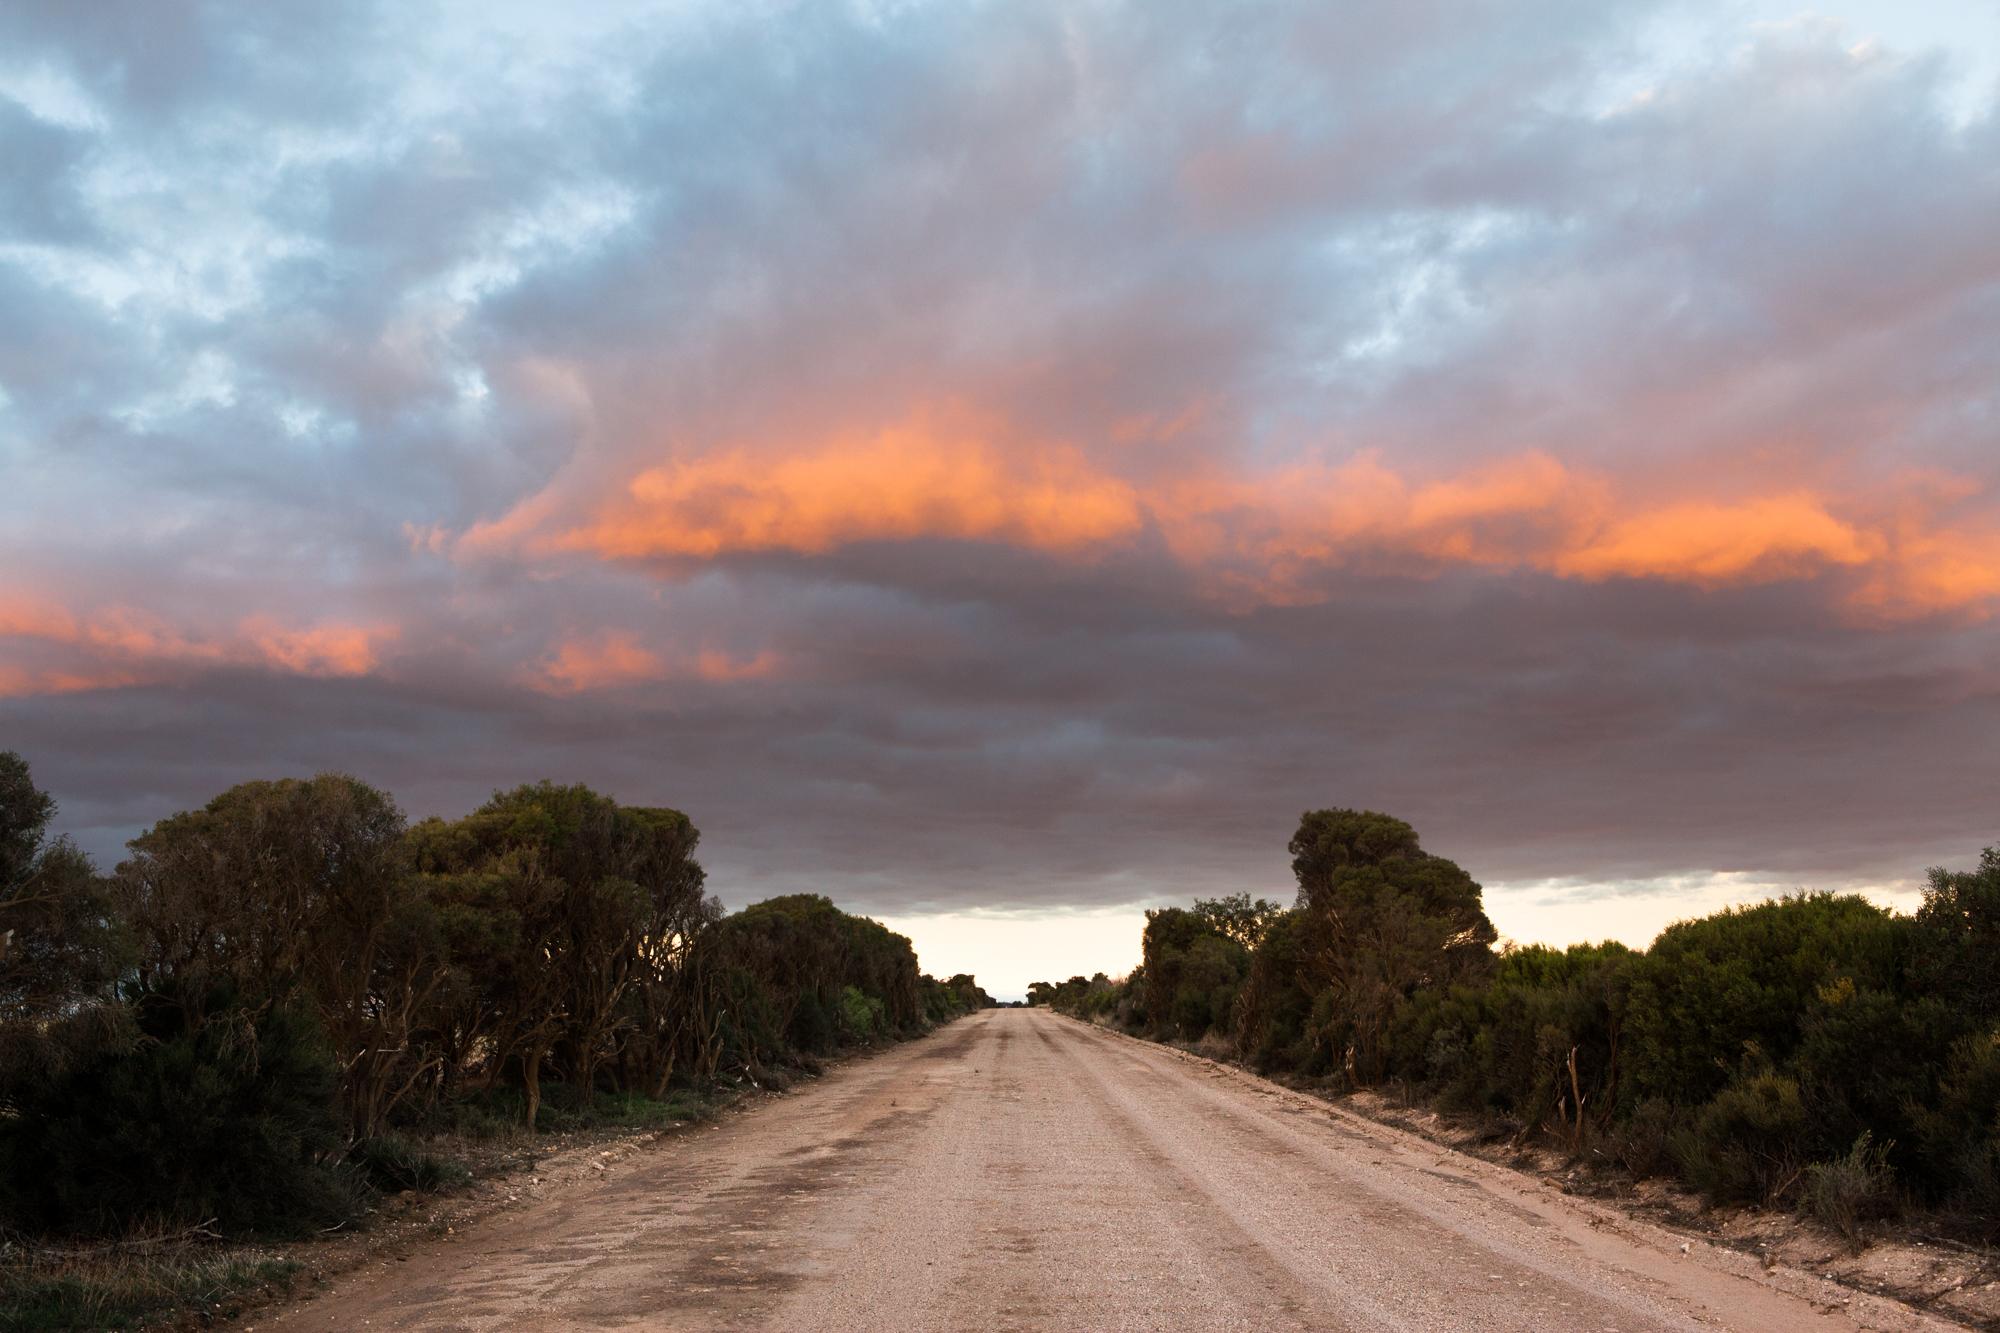 52-Bec_Kilpatrick_Photography_AustraliaIMG_7446